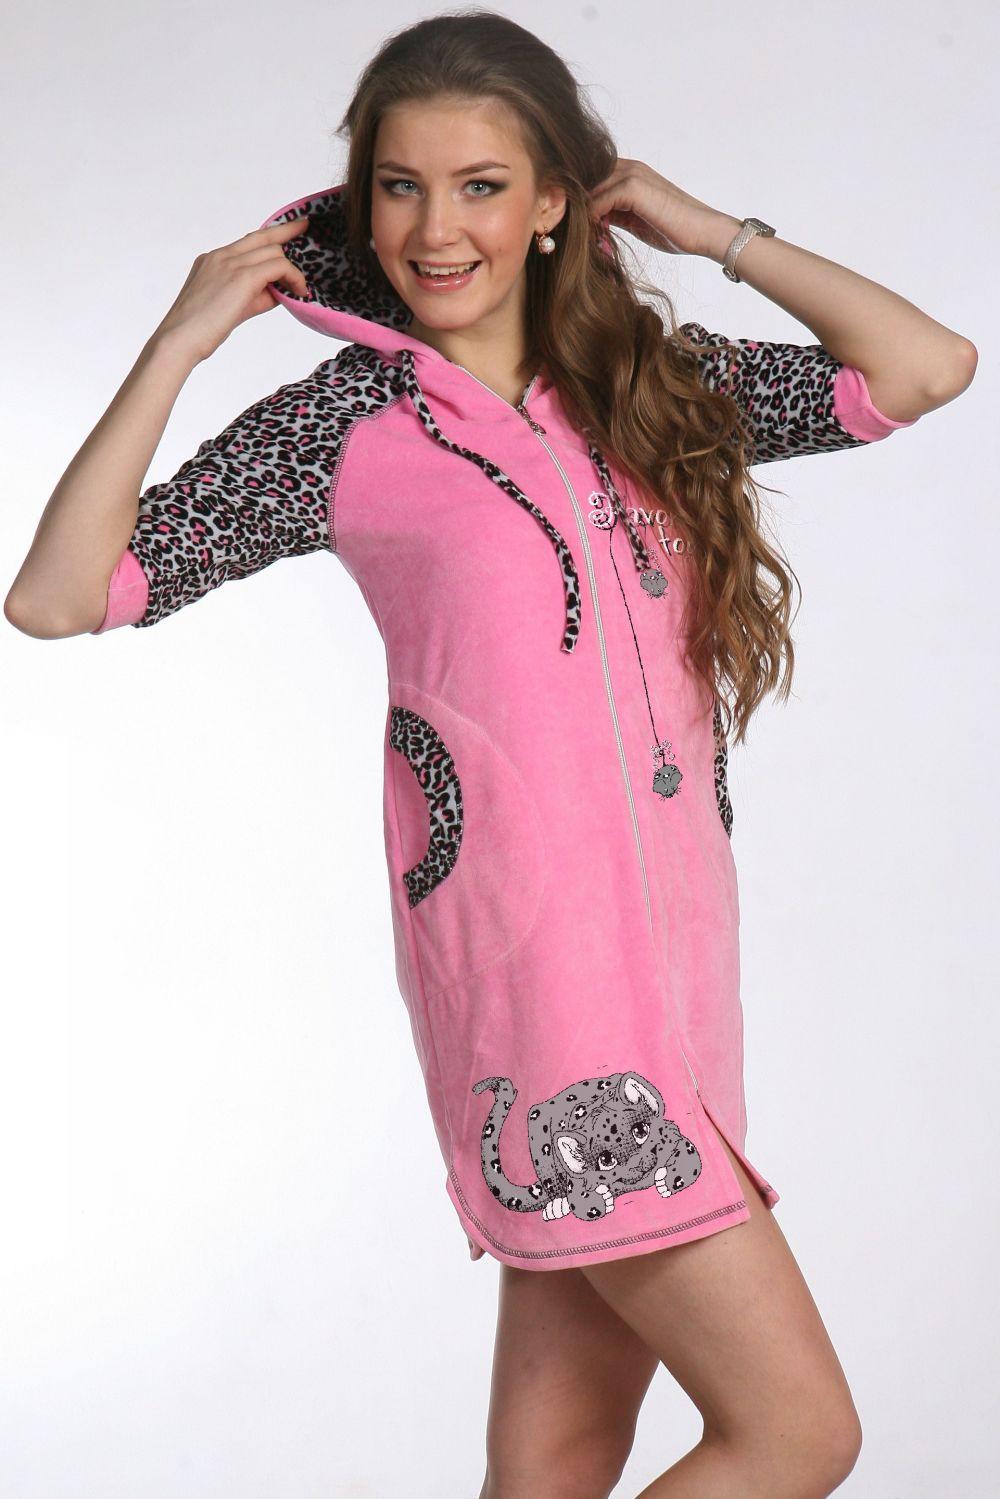 Халат женский Cheetah с капюшономКоллекция ВЕСНА-ЛЕТО<br><br><br>Размер: 48